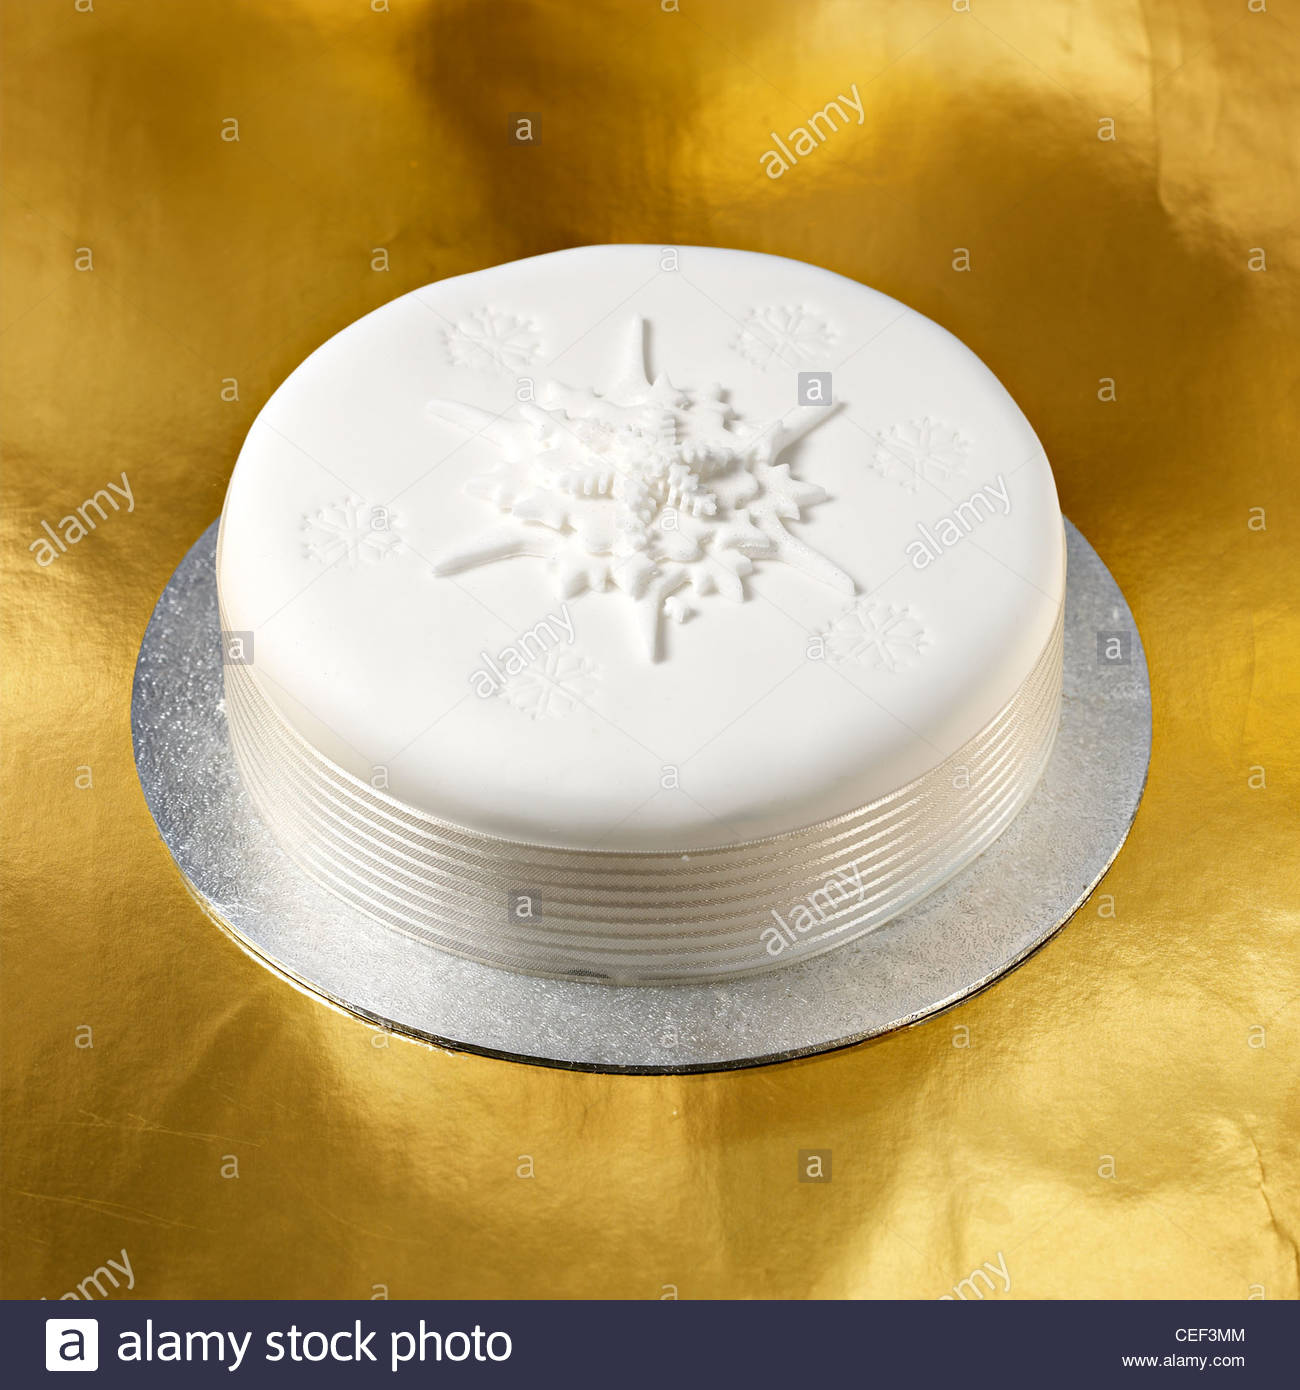 Outstanding Waitrose White Snow Flaked Iced Xmas Cake Stock Photo 43358132 Funny Birthday Cards Online Inifofree Goldxyz